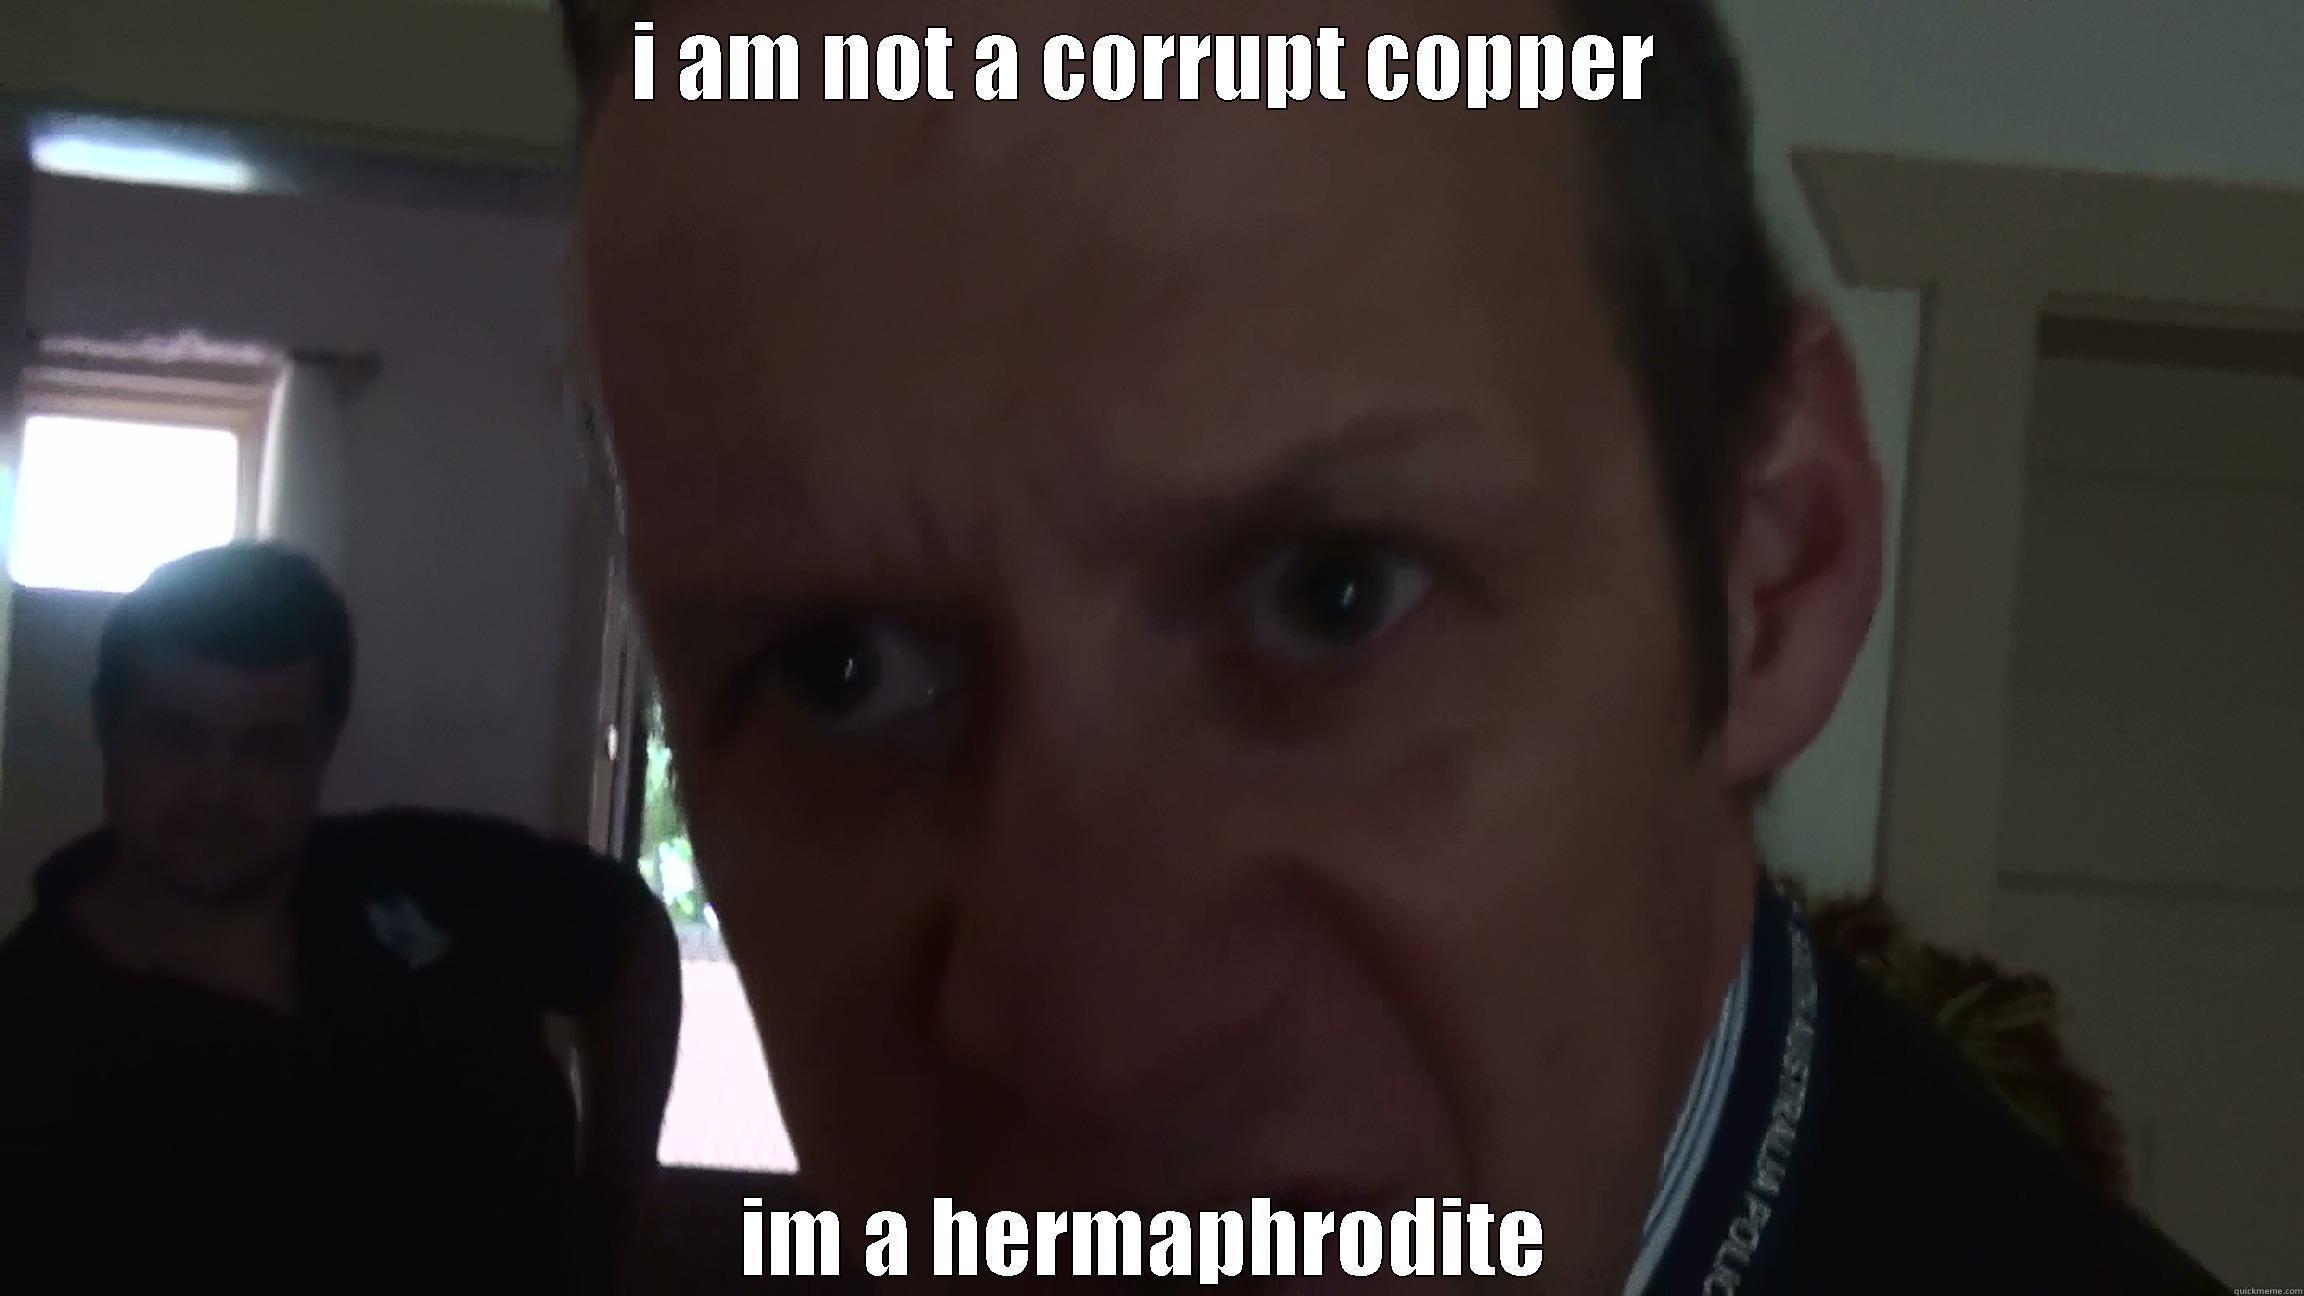 monks the goose - I AM NOT A CORRUPT COPPER IM A HERMAPHRODITE Misc